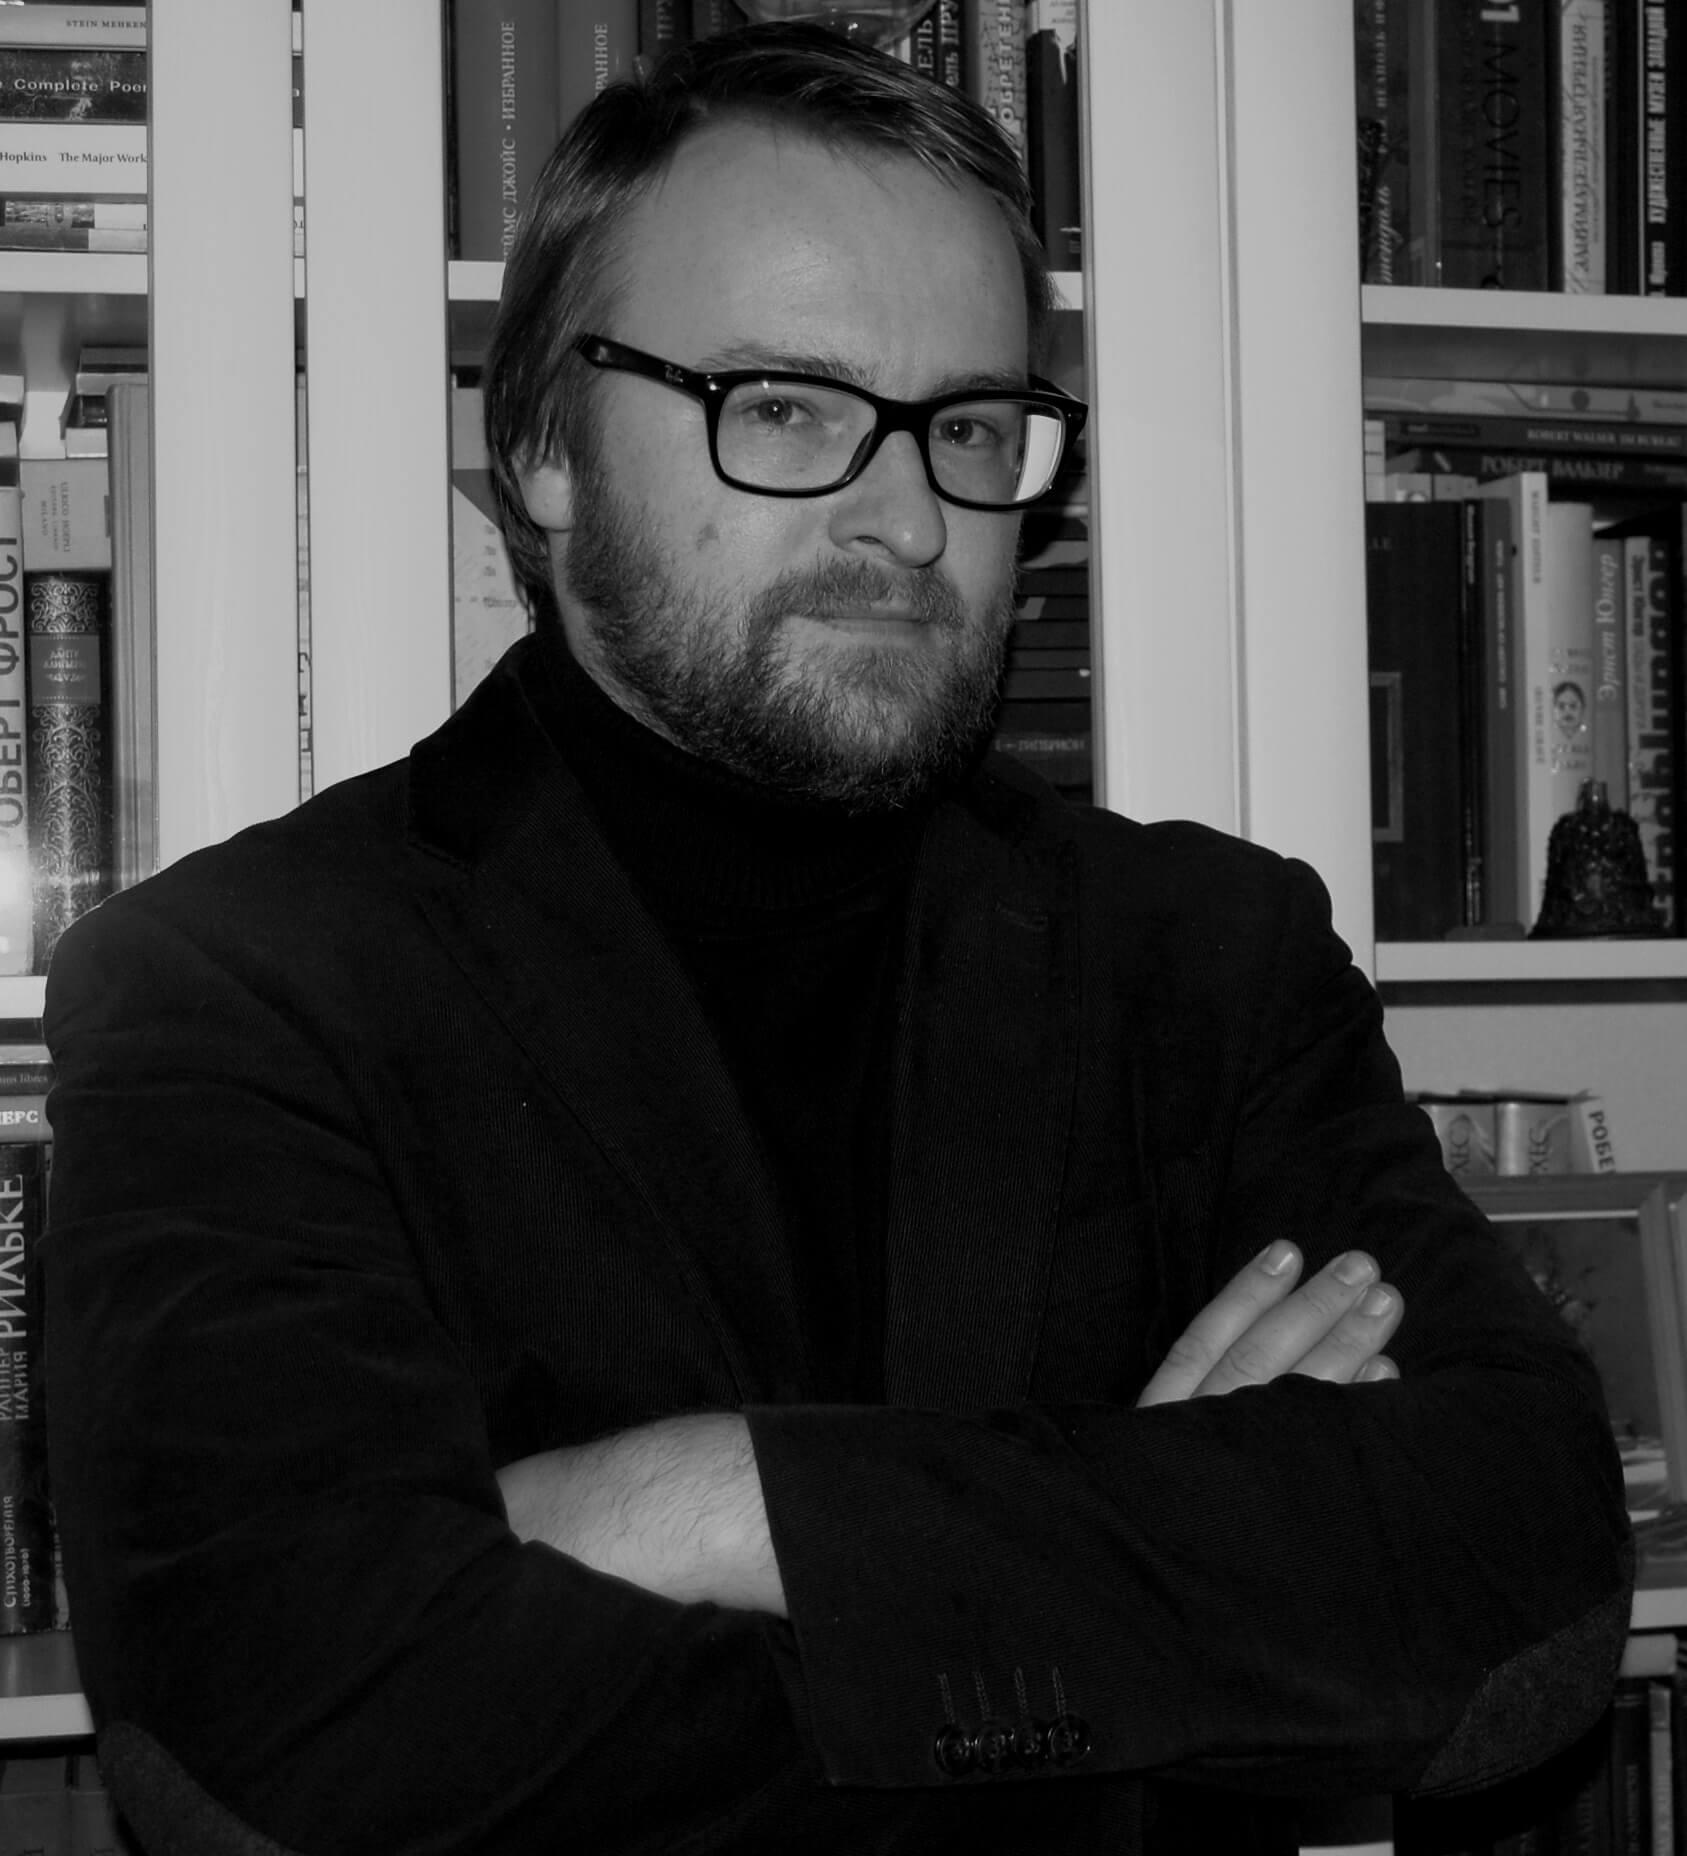 Artiom Wierle